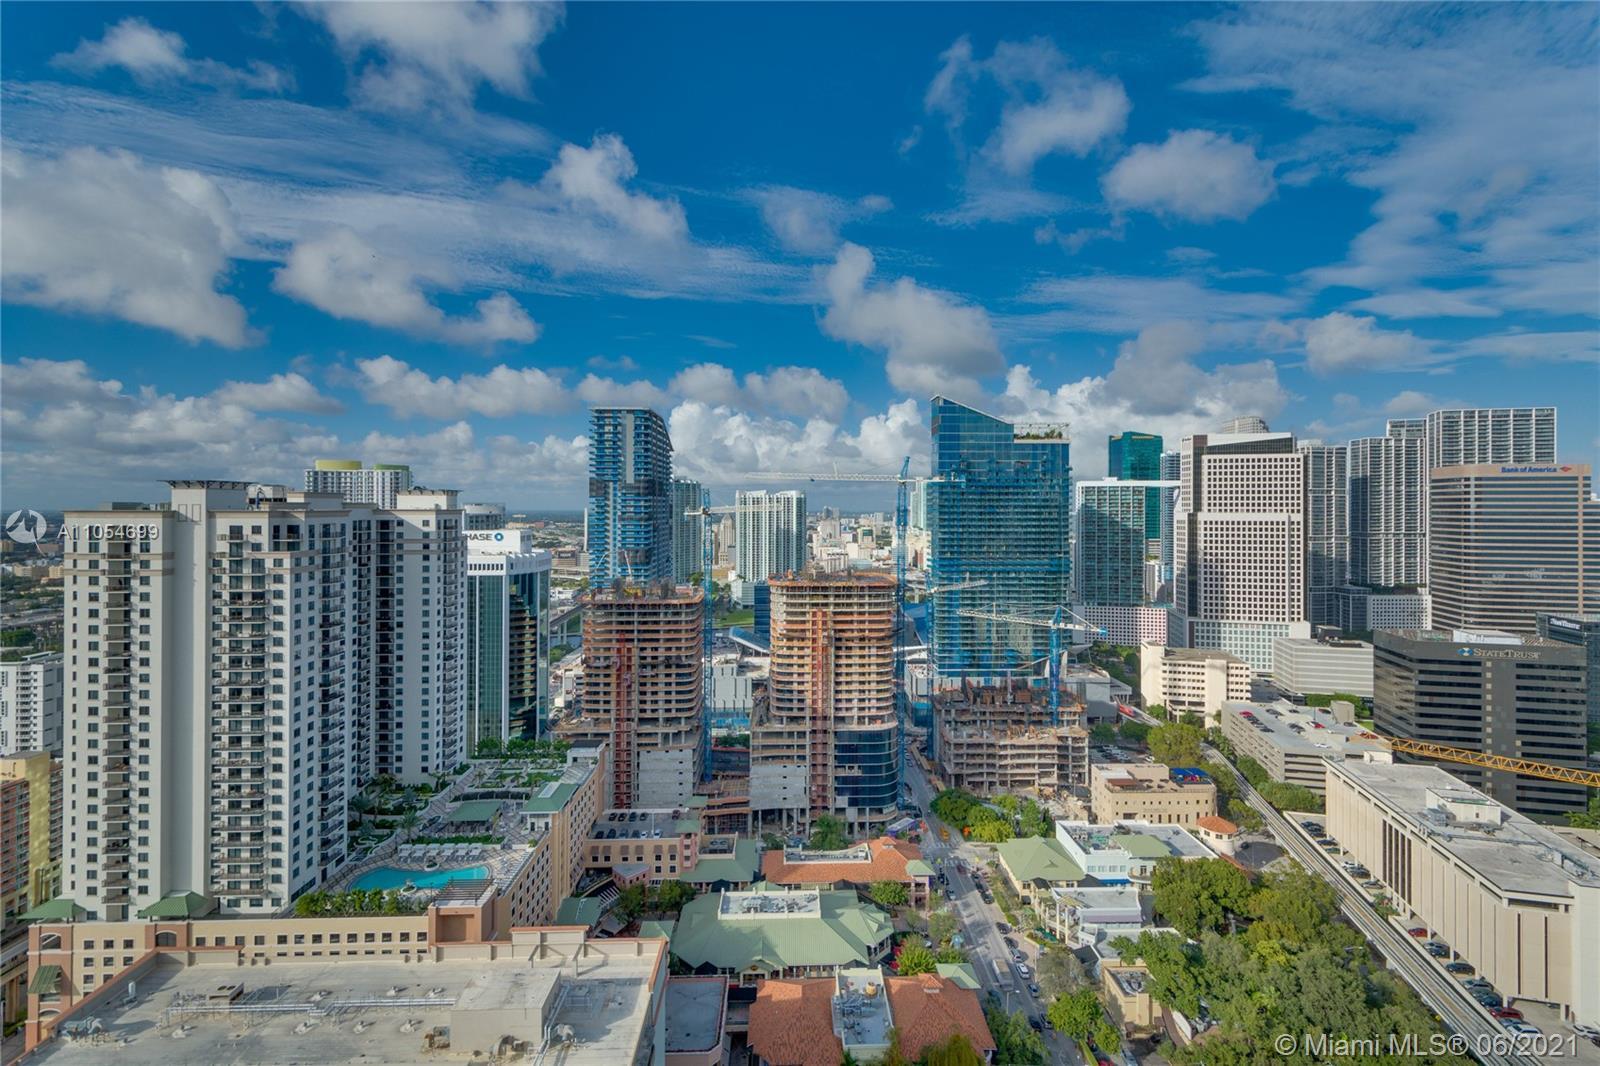 1100 Millecento #3607 - 1100 S Miami Ave #3607, Miami, FL 33130